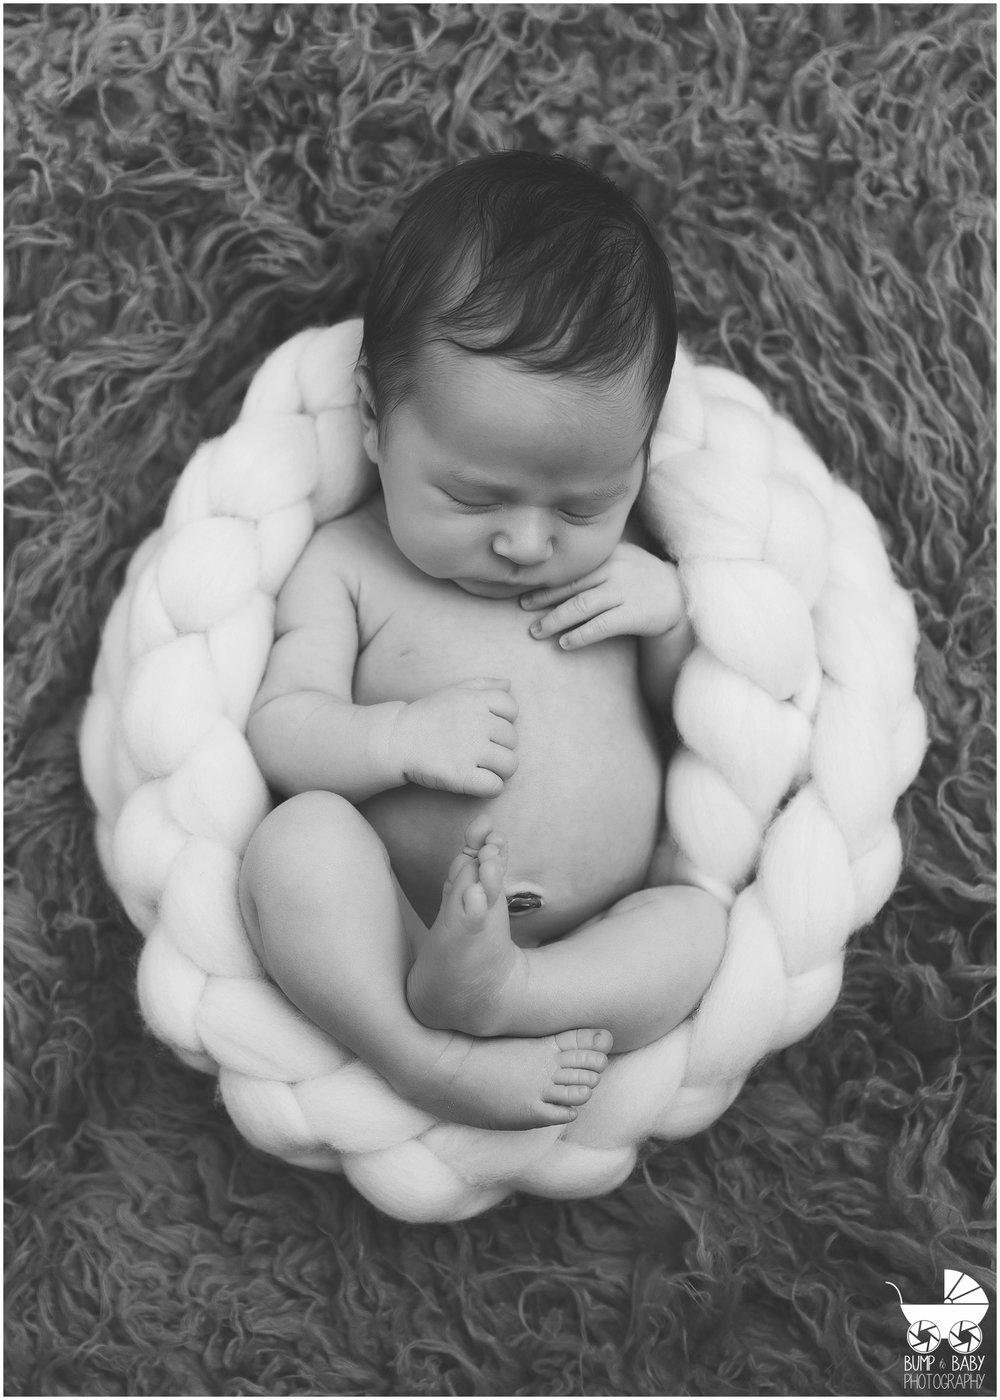 Newborn-Baby-Girl-in-Braided-bowl.jpg